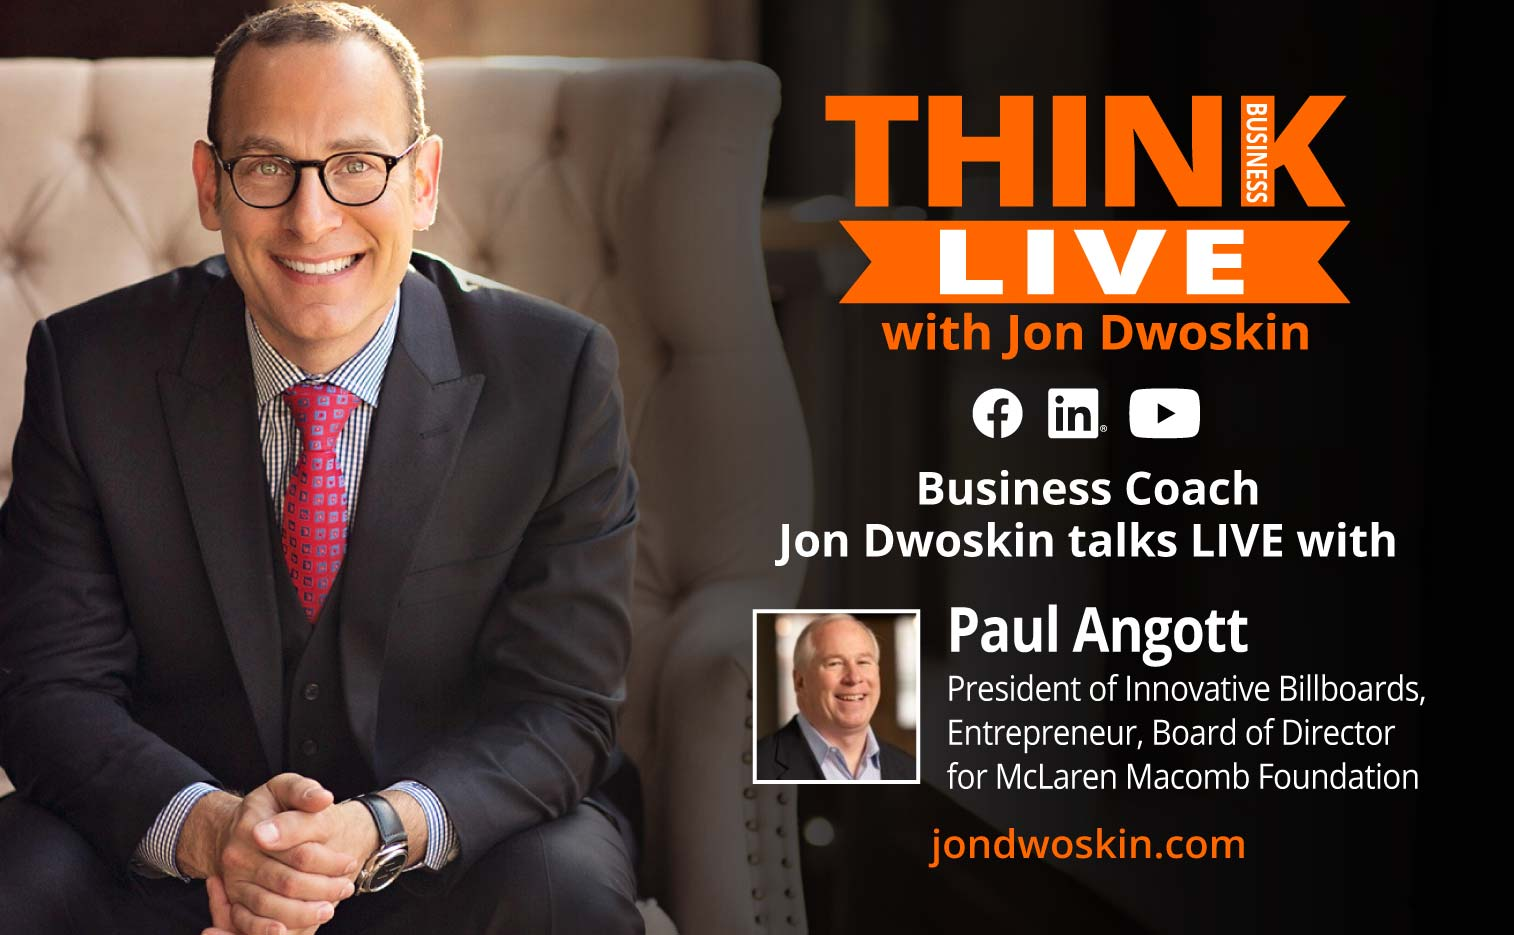 Jon Dwoskin Talks LIVE with Paul Angott, President of Innovative Billboards, Entrepreneur, Board of Director for McLaren Macomb Foundation